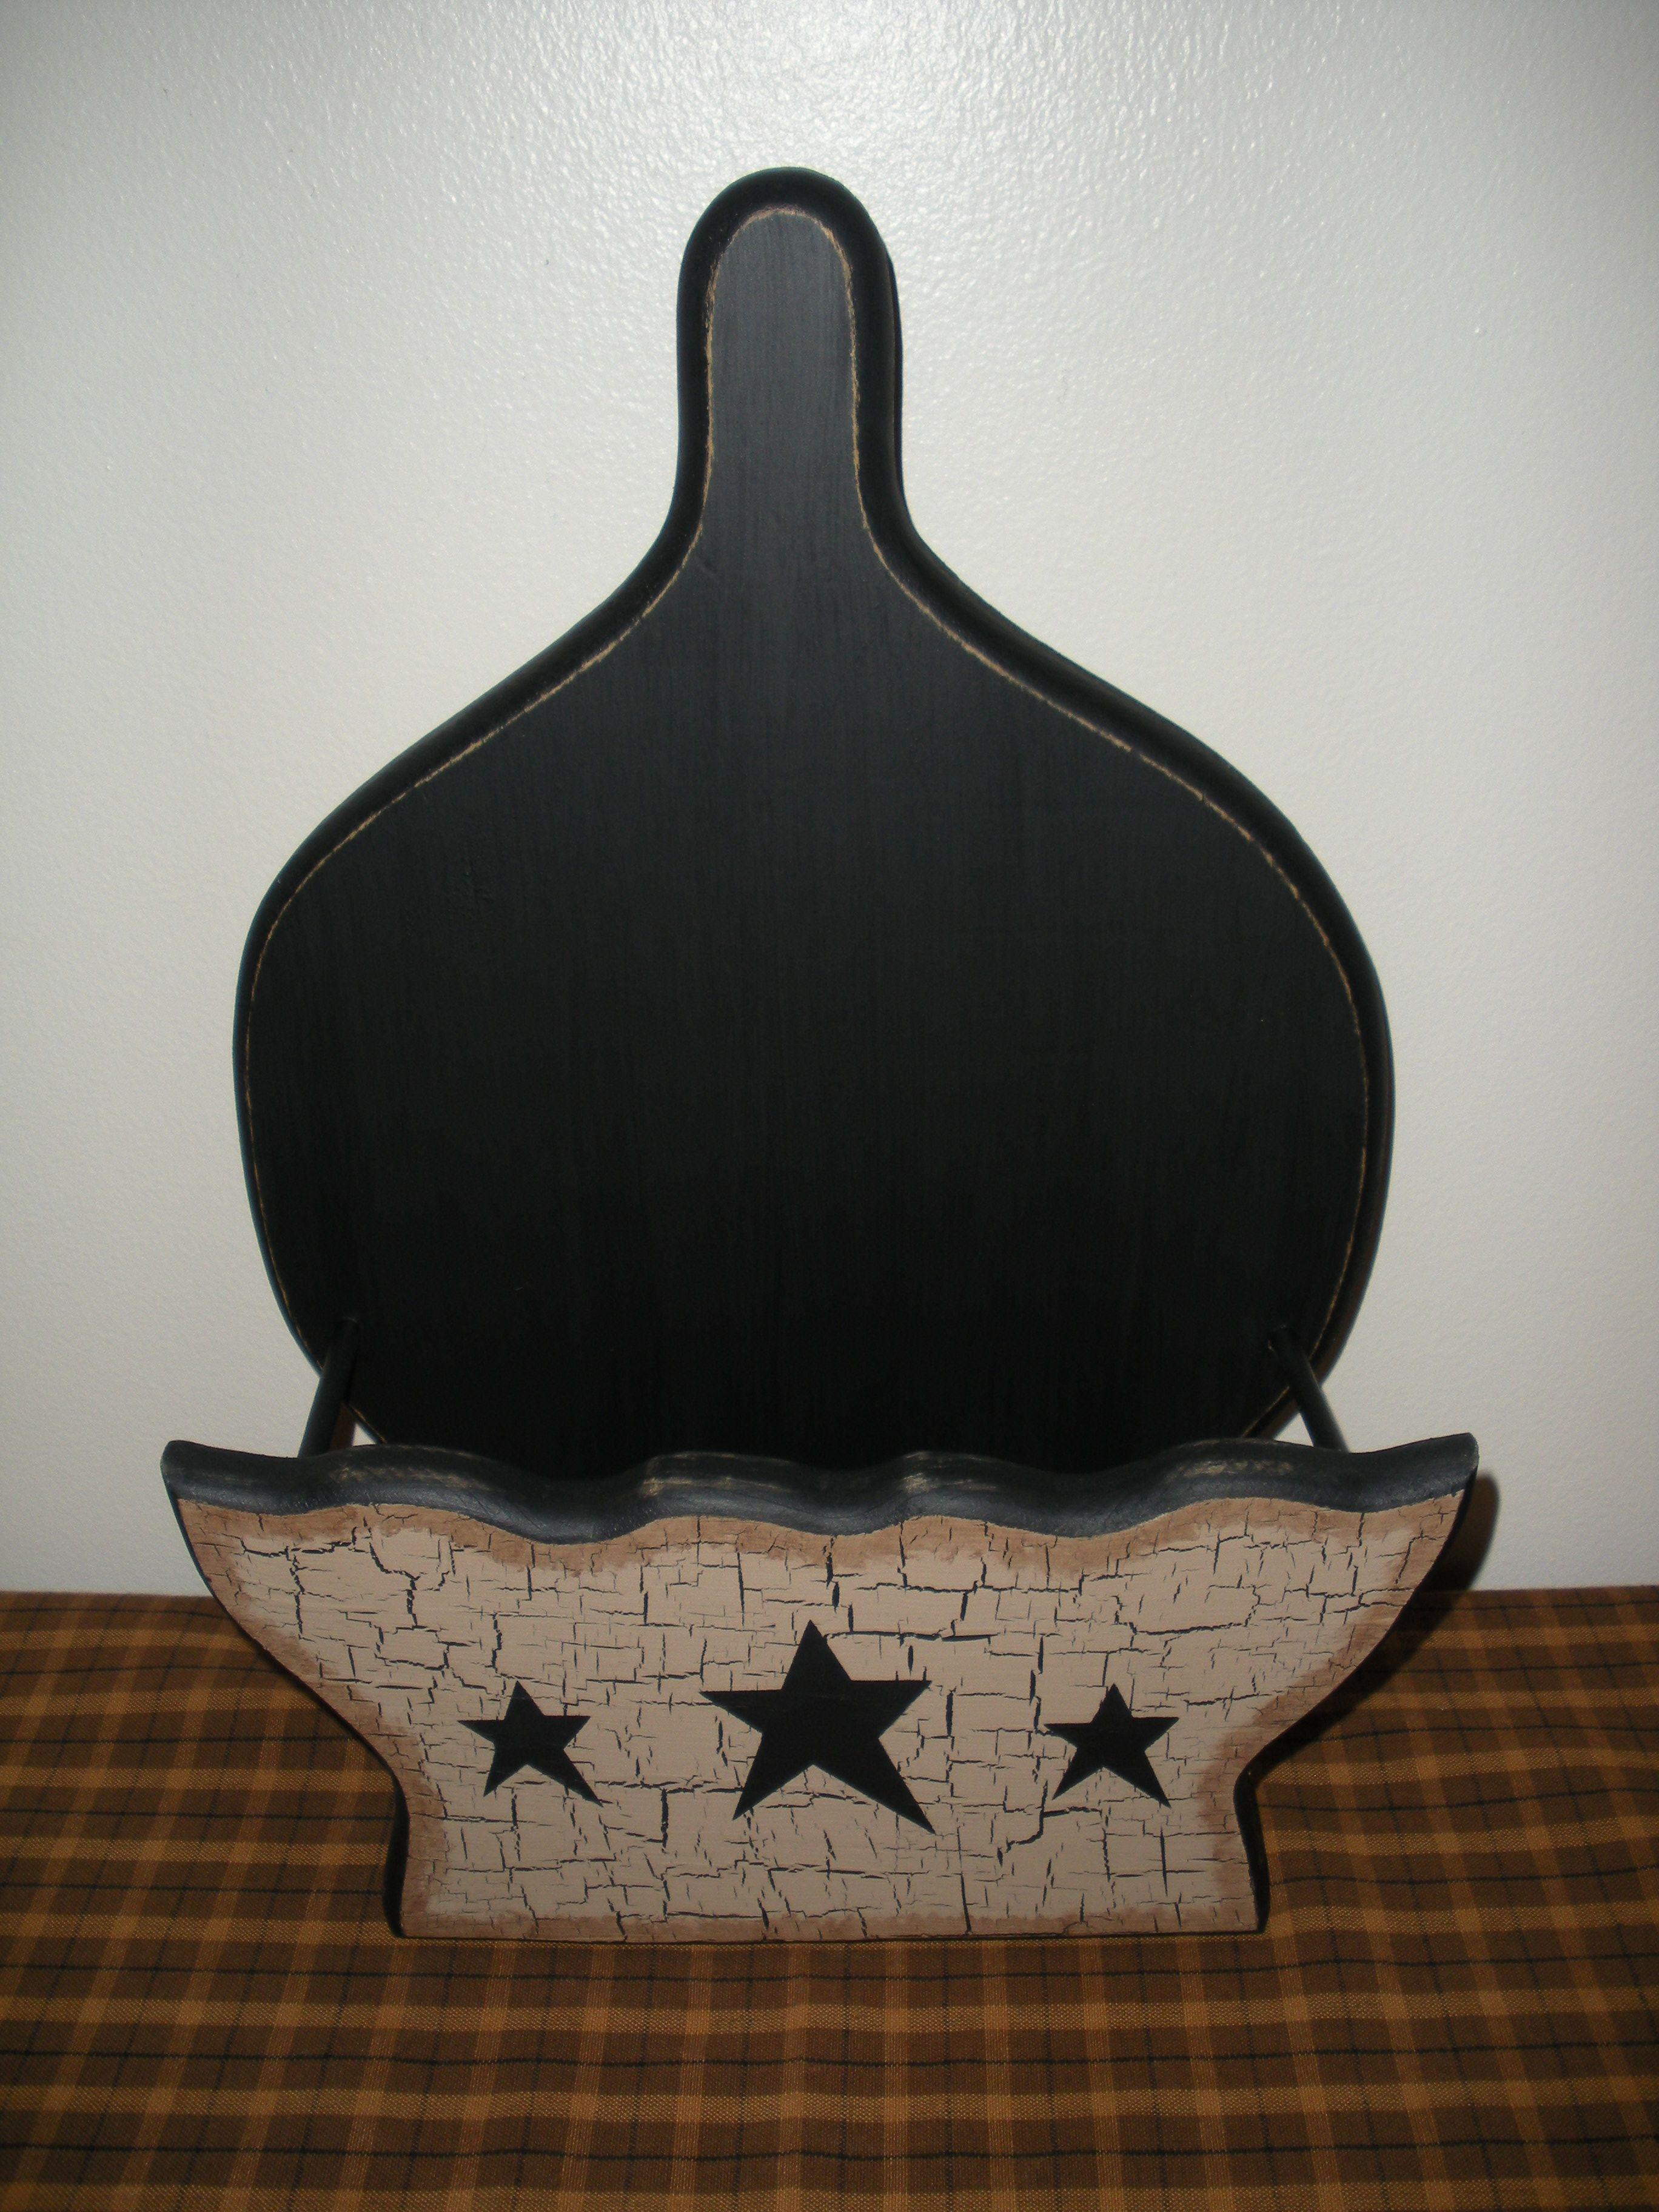 Primitive Decor Paper Plate Holder http://www.ebay.com/sch ...